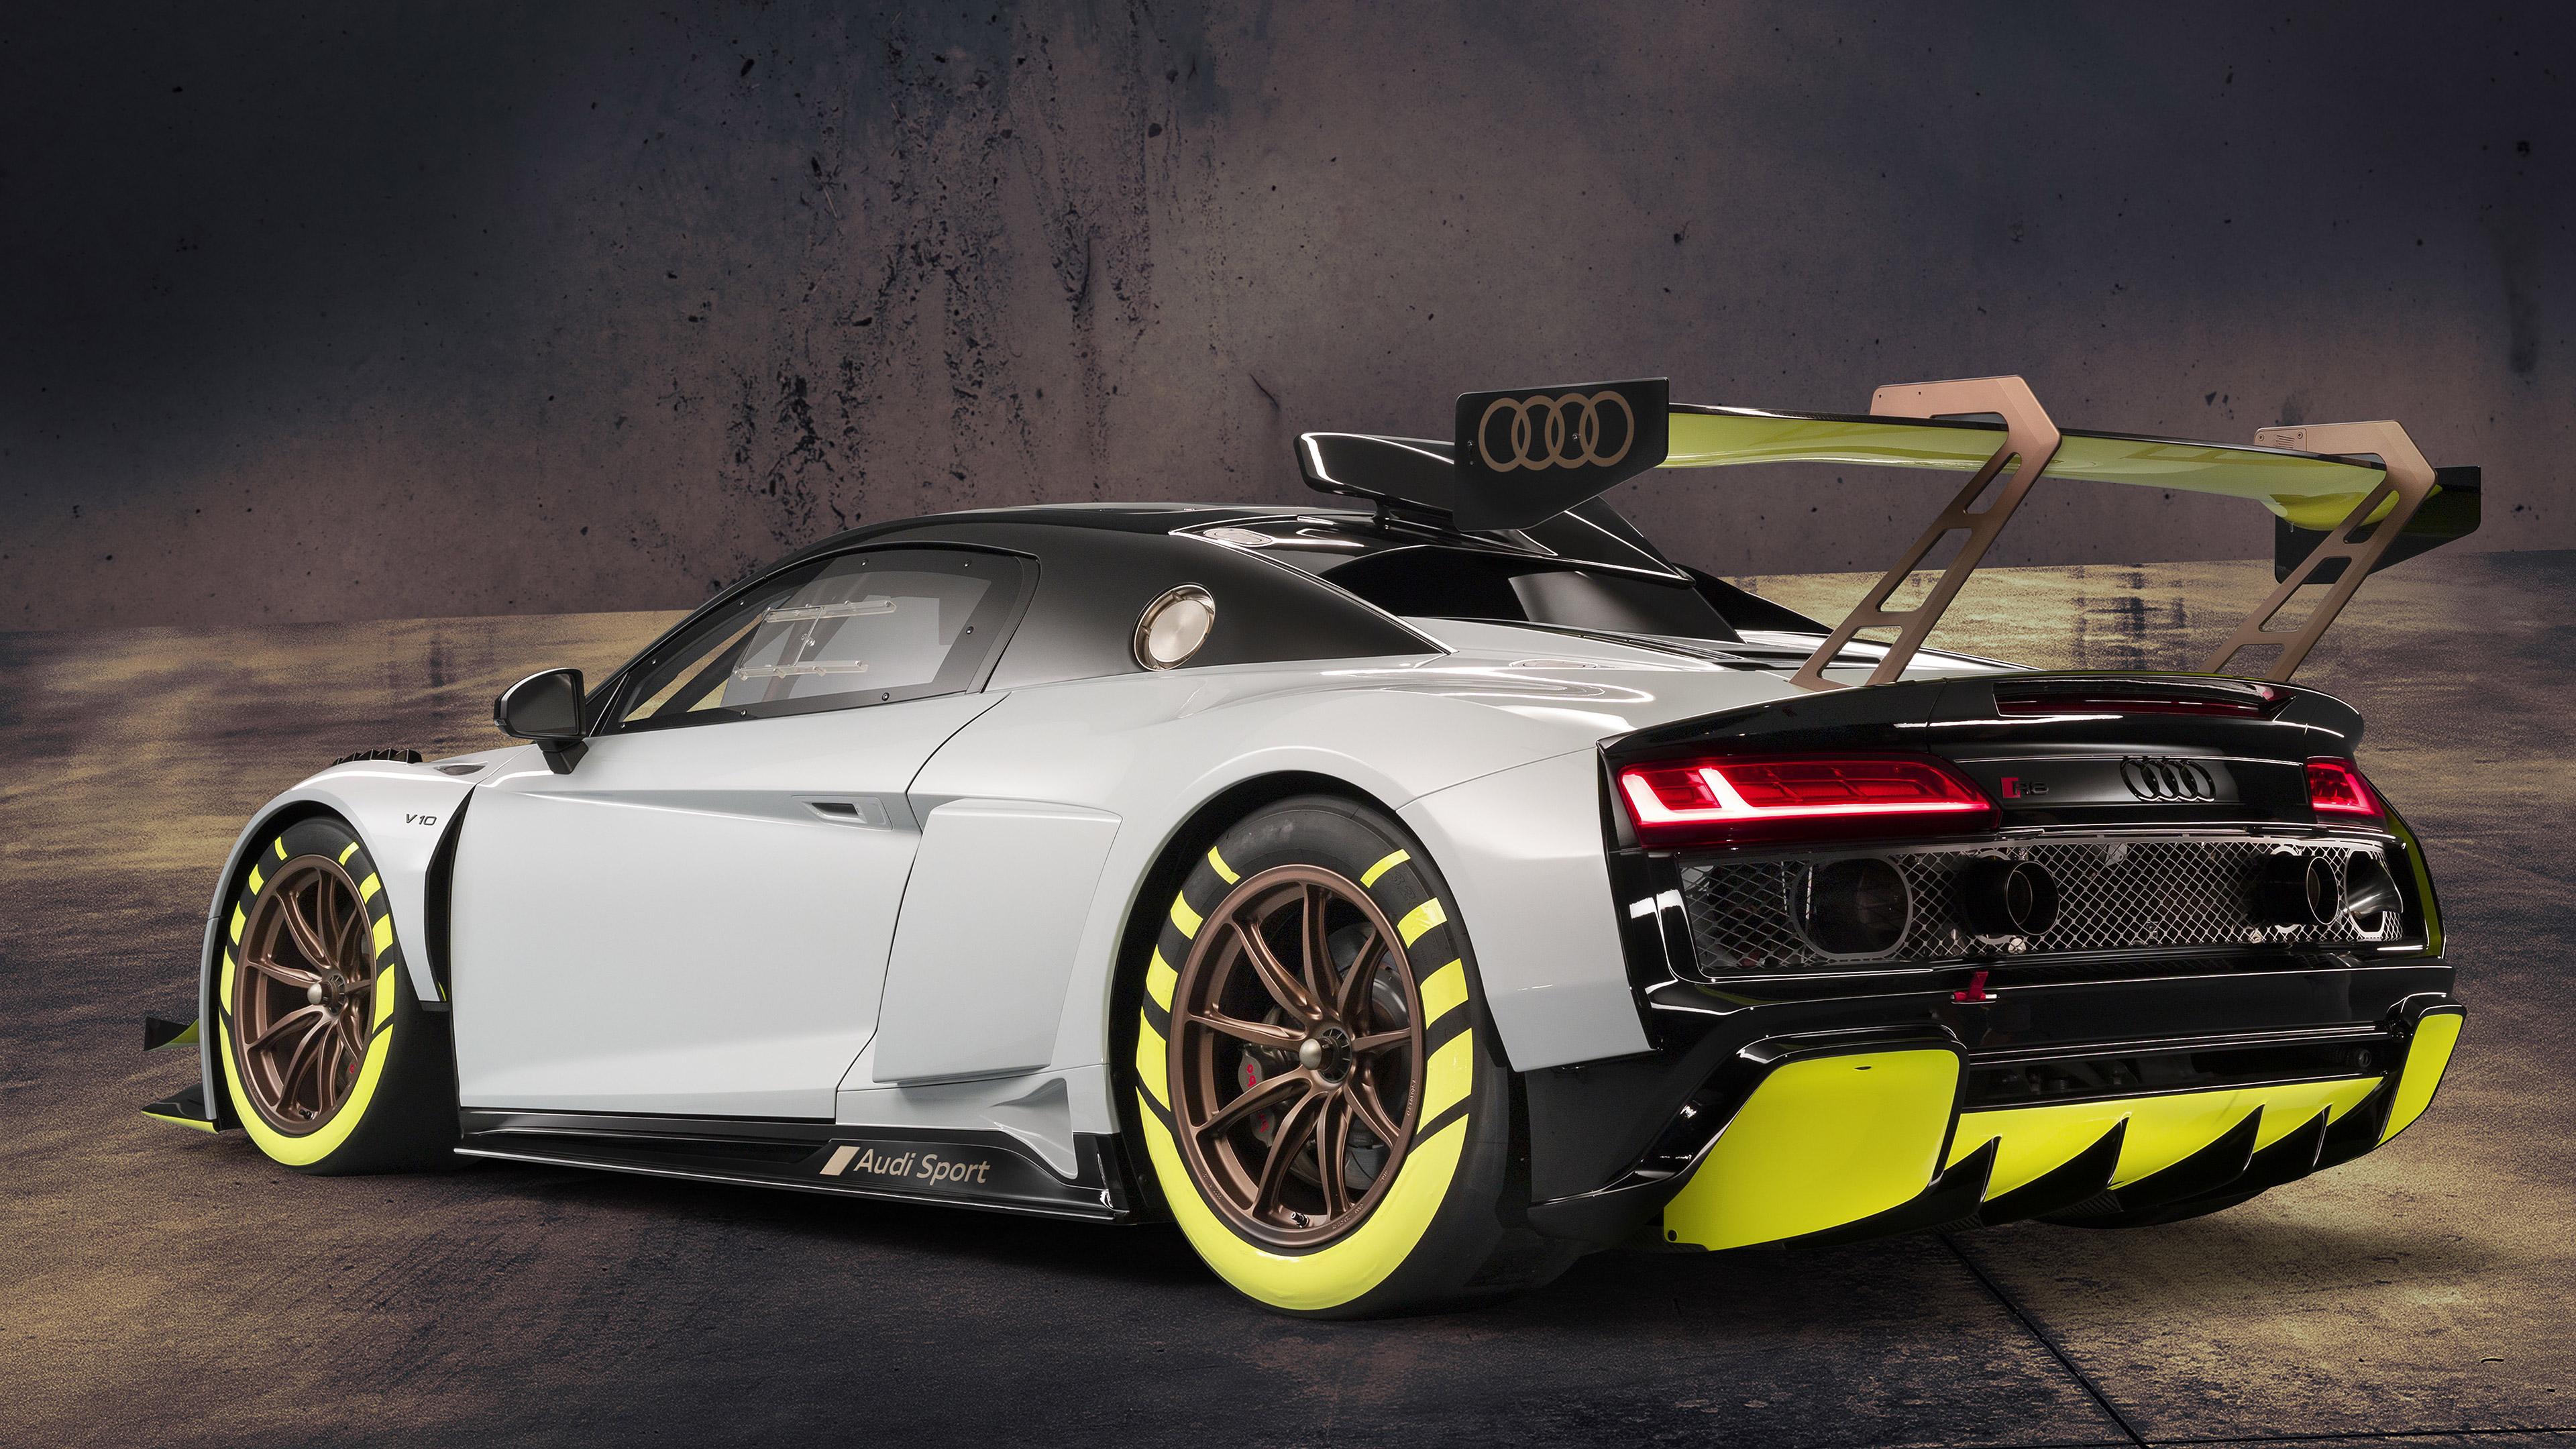 2020 Audi R8 LMS GT2 4k Ultra HD Wallpaper Background Image 3840x2160